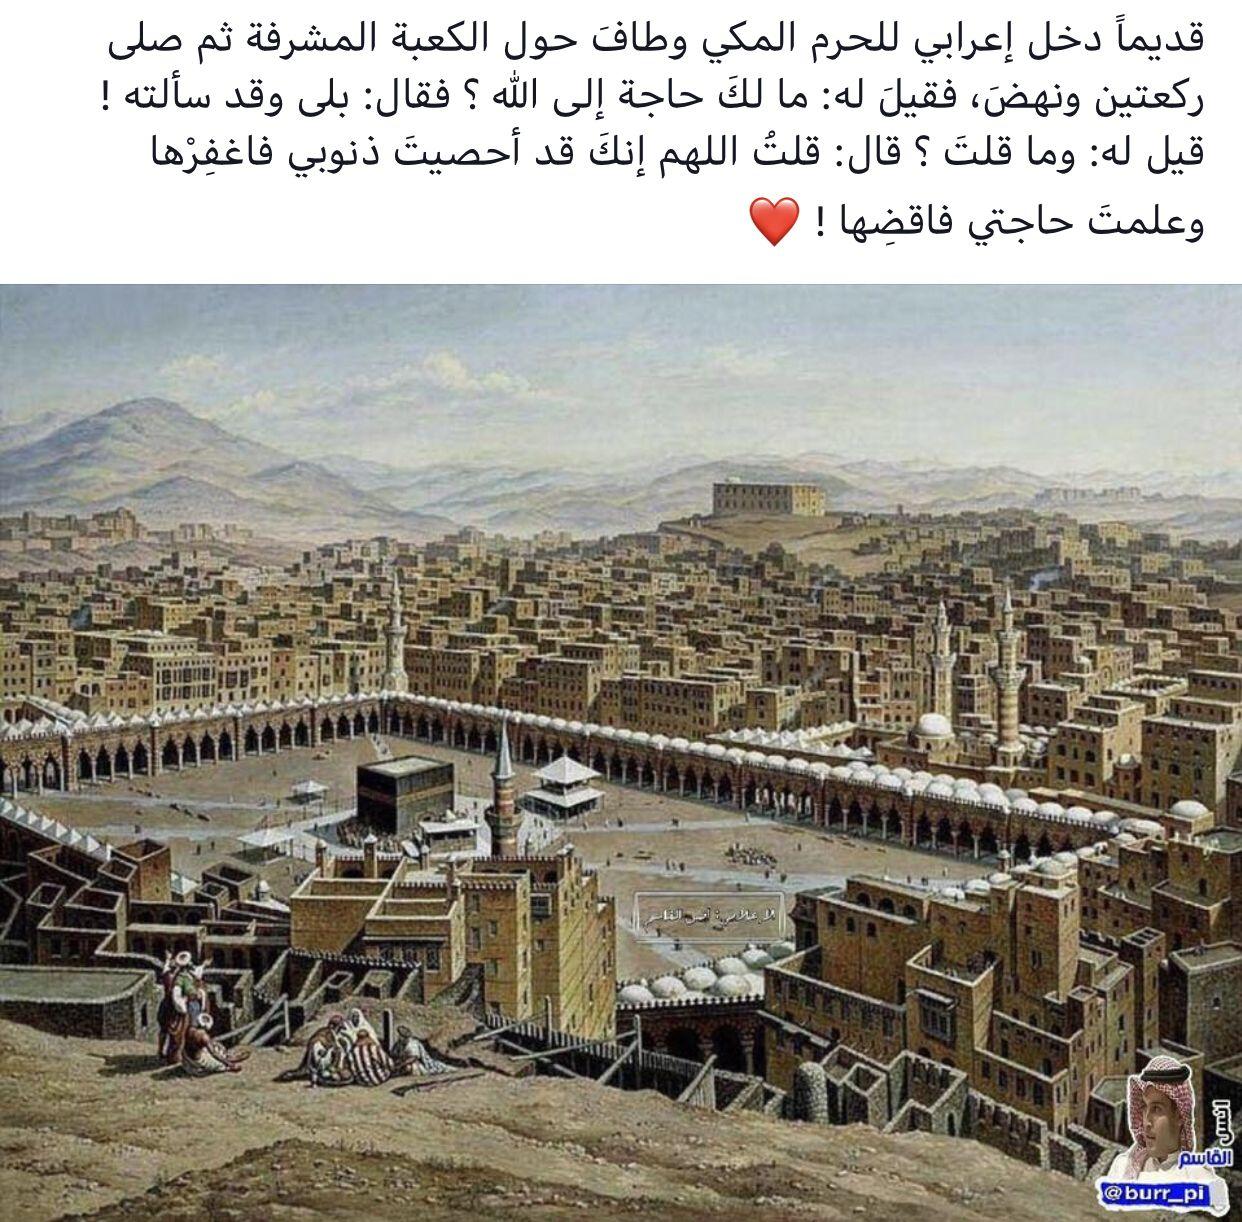 Pin By أنس القاسم On قصص من التاريخ Paris Skyline Holy Quran Skyline